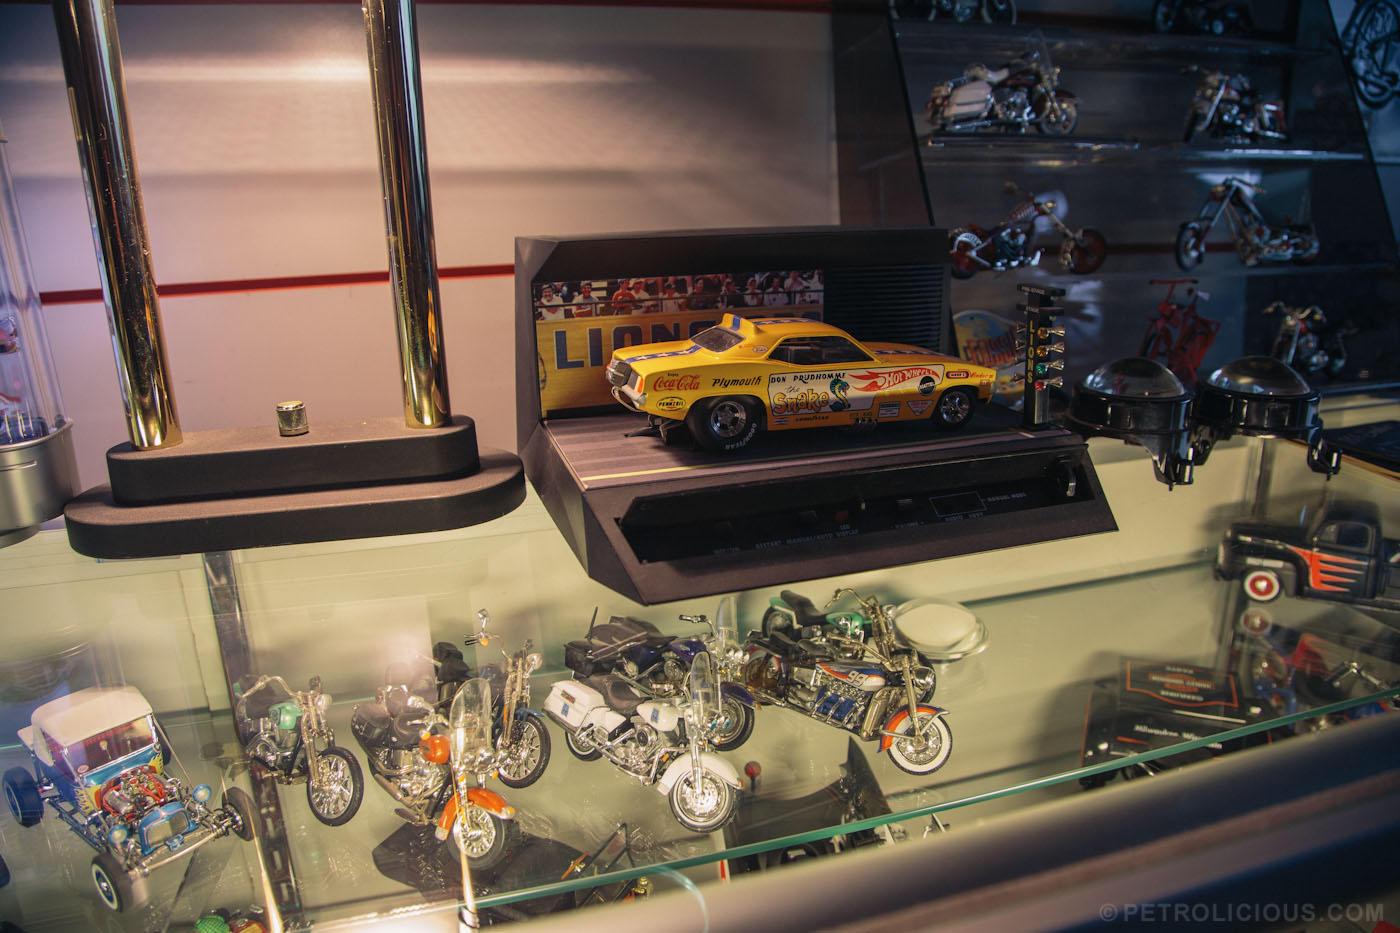 Colectie machete auto - Colectie machete auto